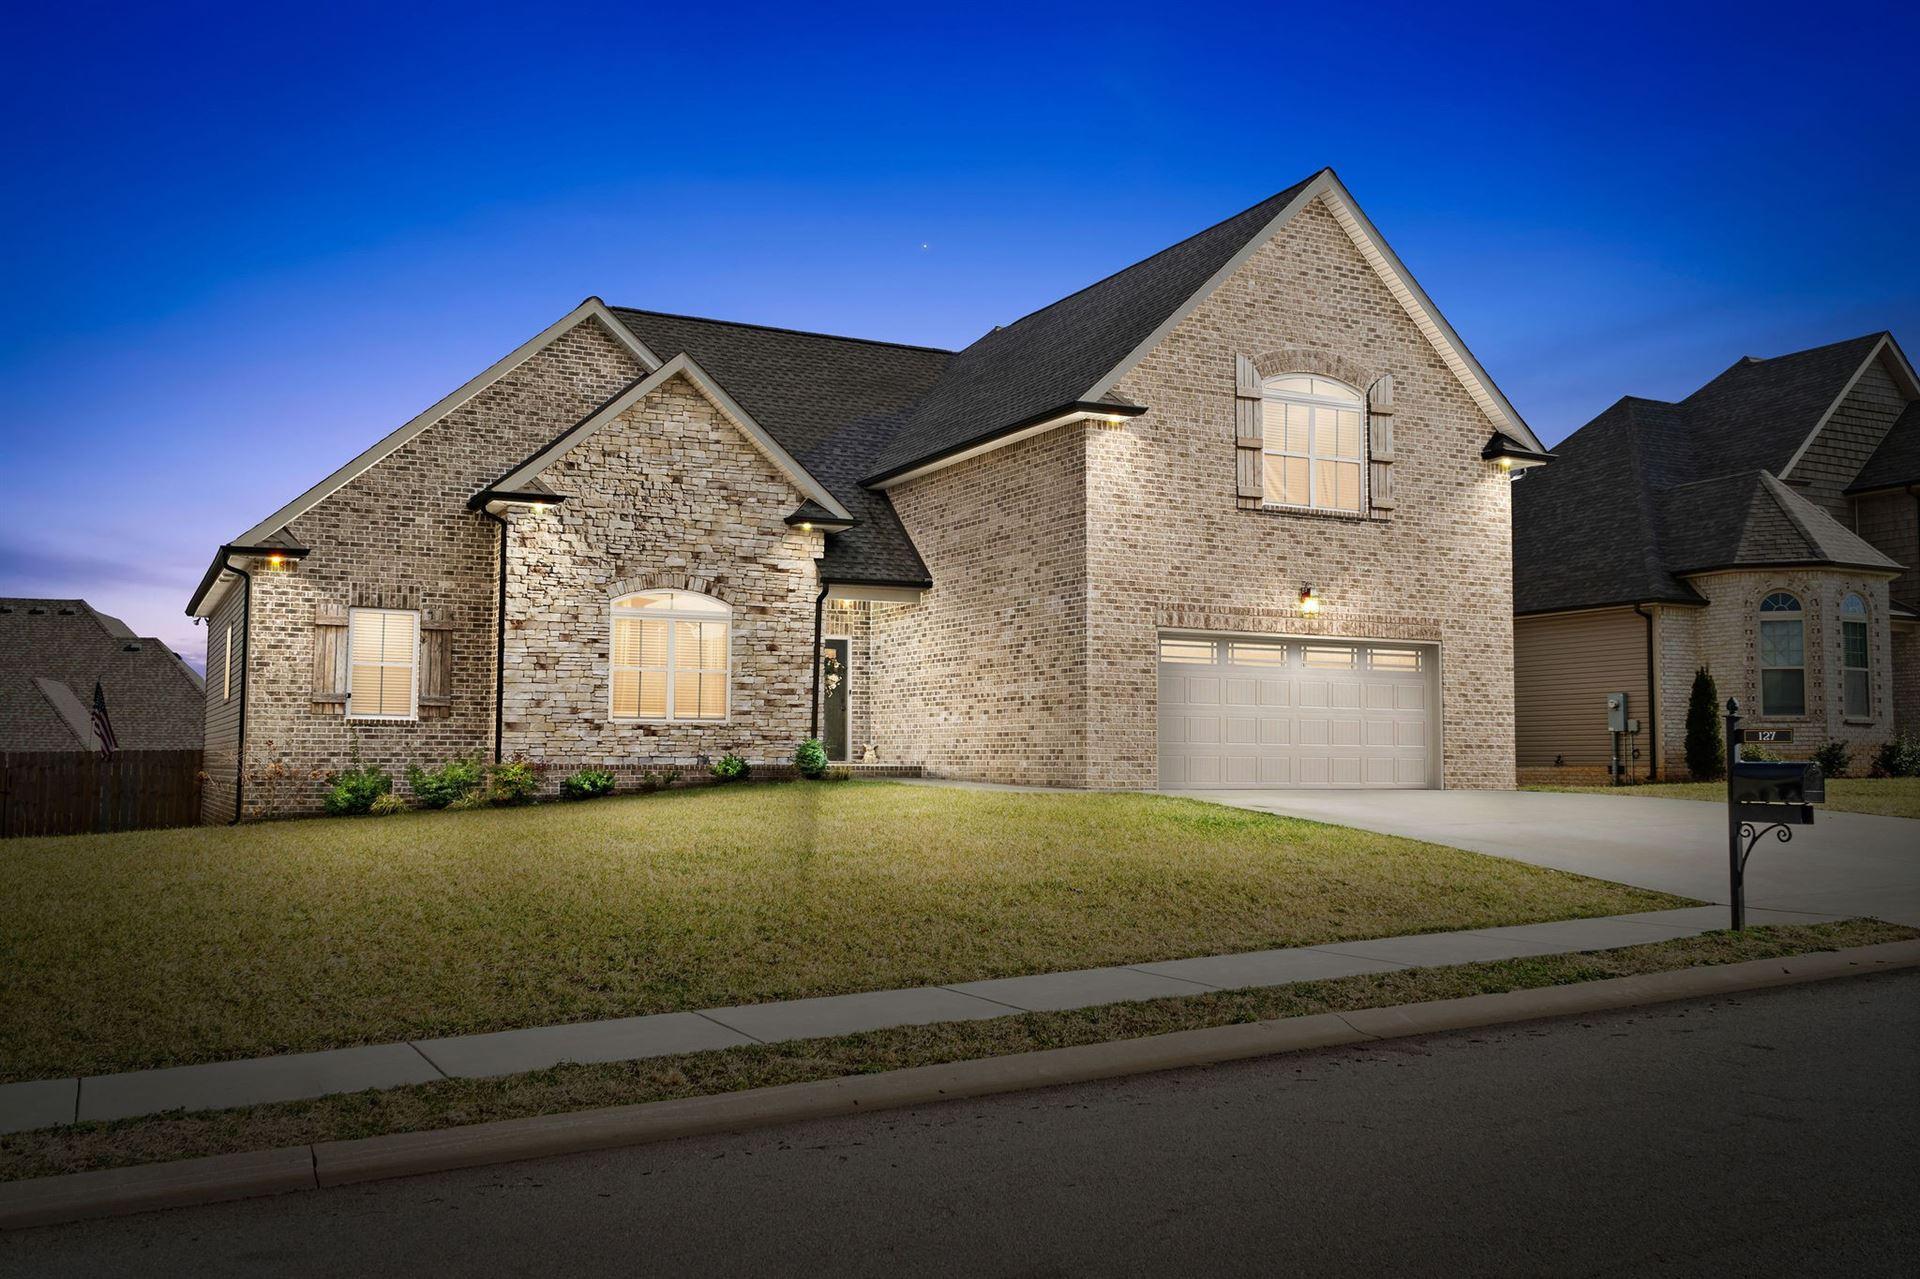 127 Overcrest Ct, Clarksville, TN 37043 - MLS#: 2226567